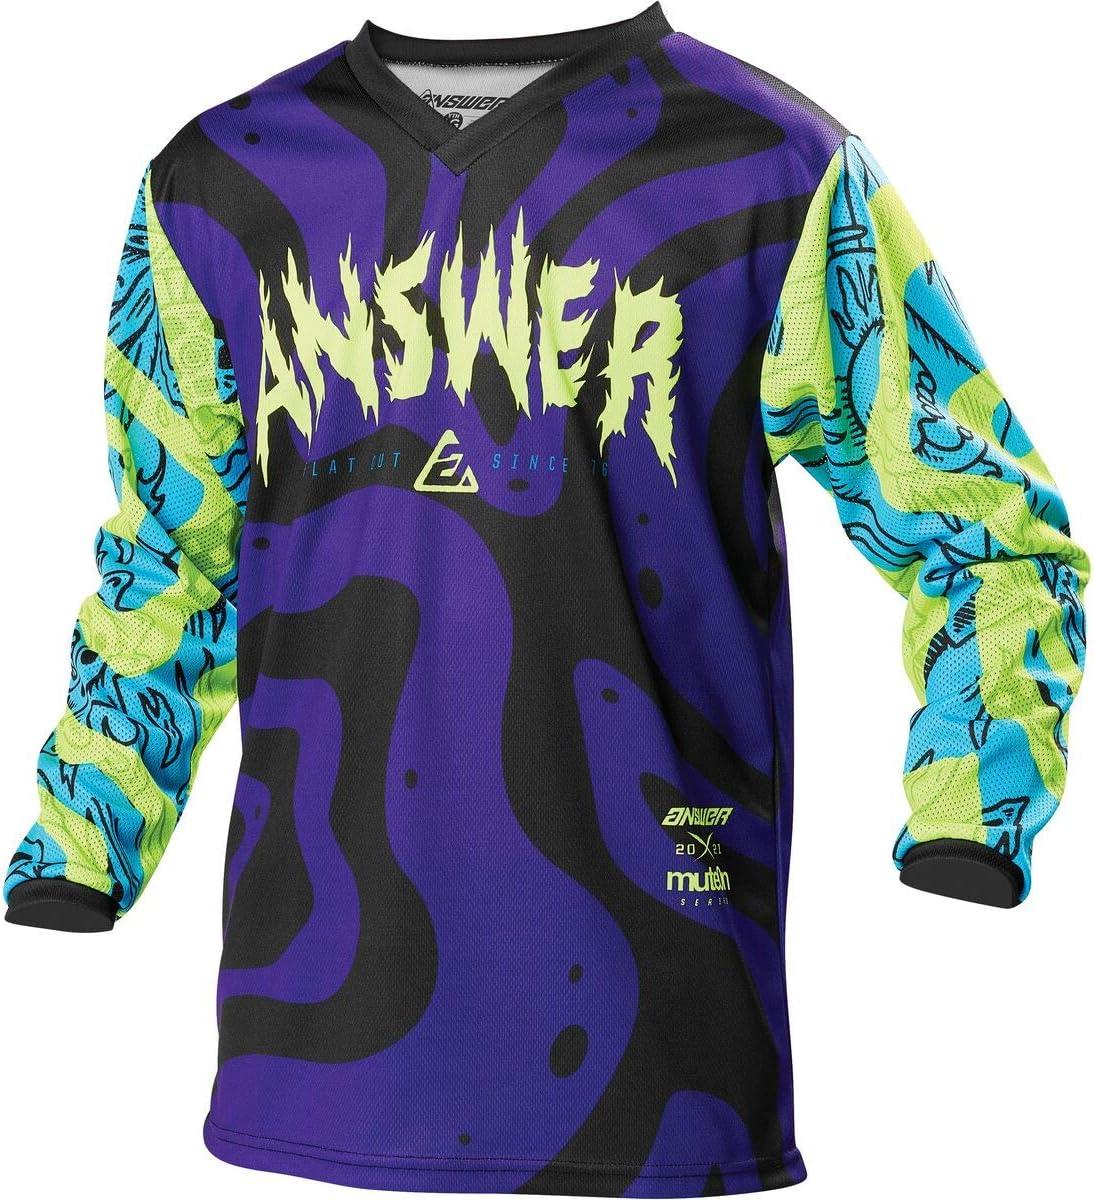 Medium Hyper Acid//Astana Answer 2021 Youth Arkon Jersey Hypno LE